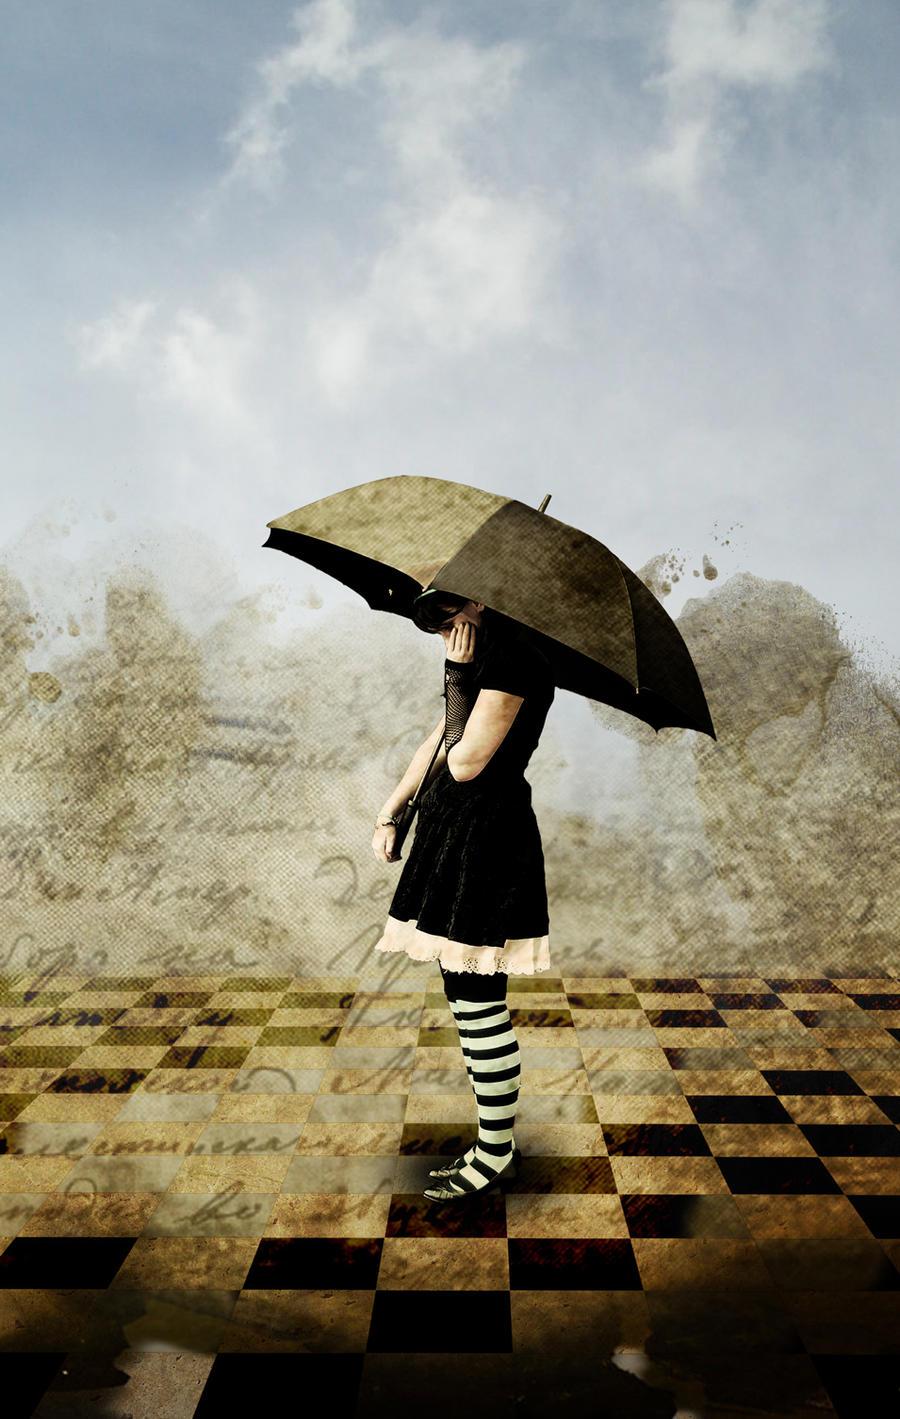 Umbrella Girl by deckardpain on DeviantArt